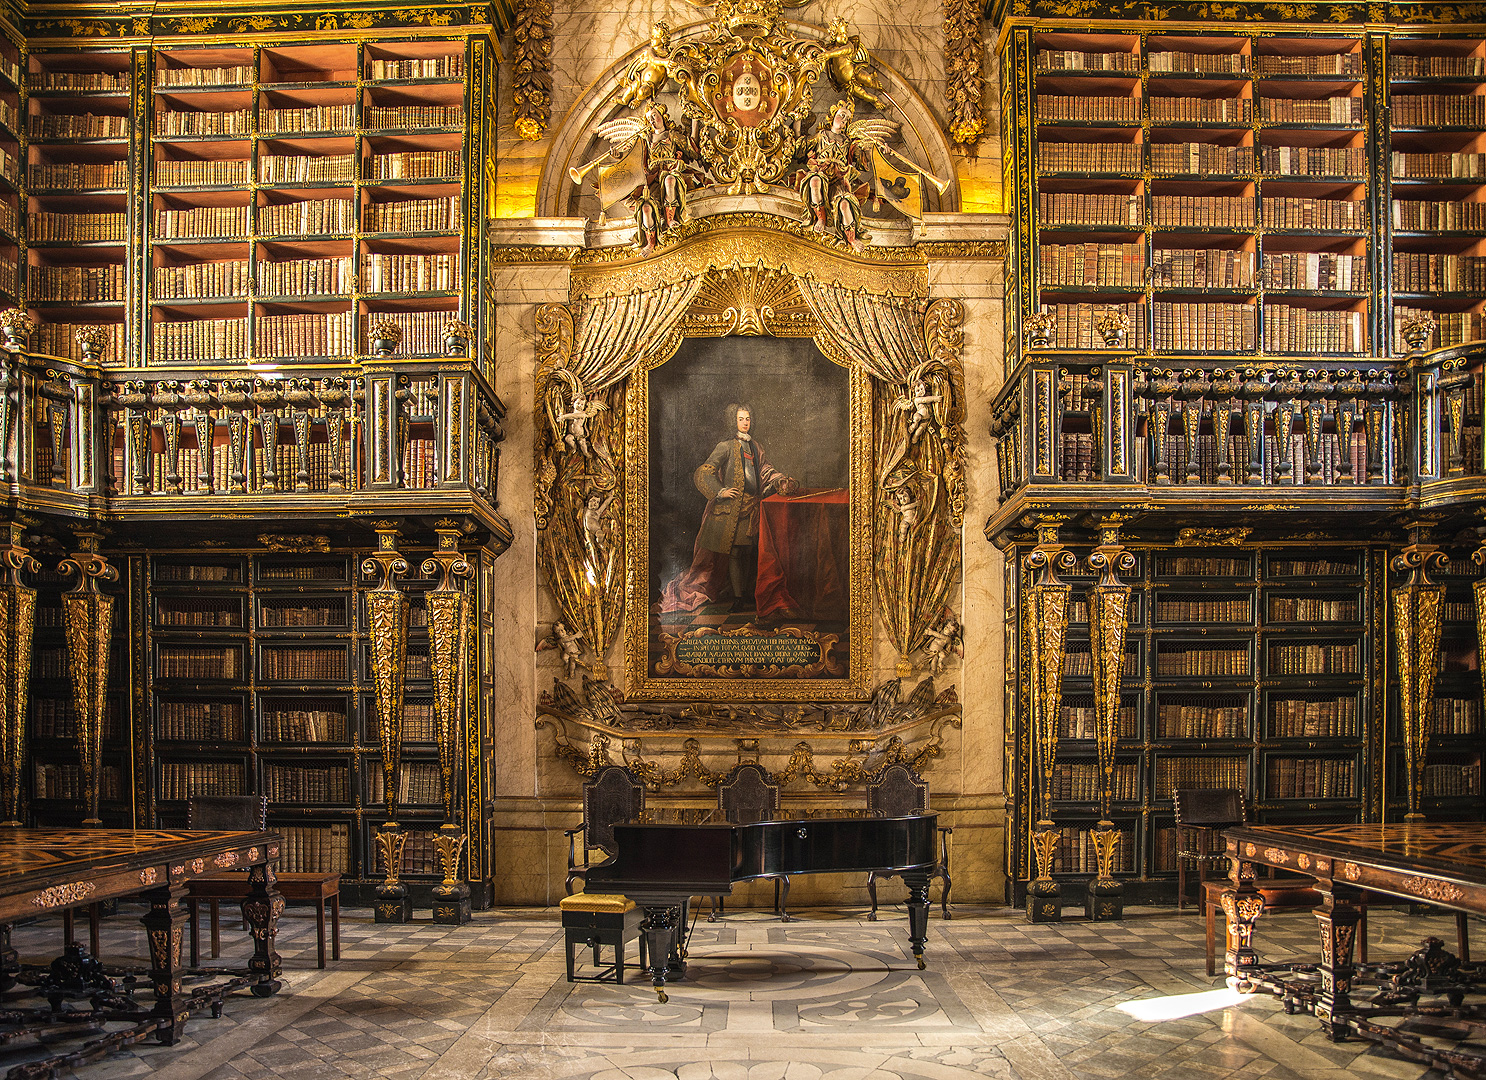 PT-Centro-Coimbra-BibliotecaJoanina2018-c-ARPT_Centro_de_Portugal